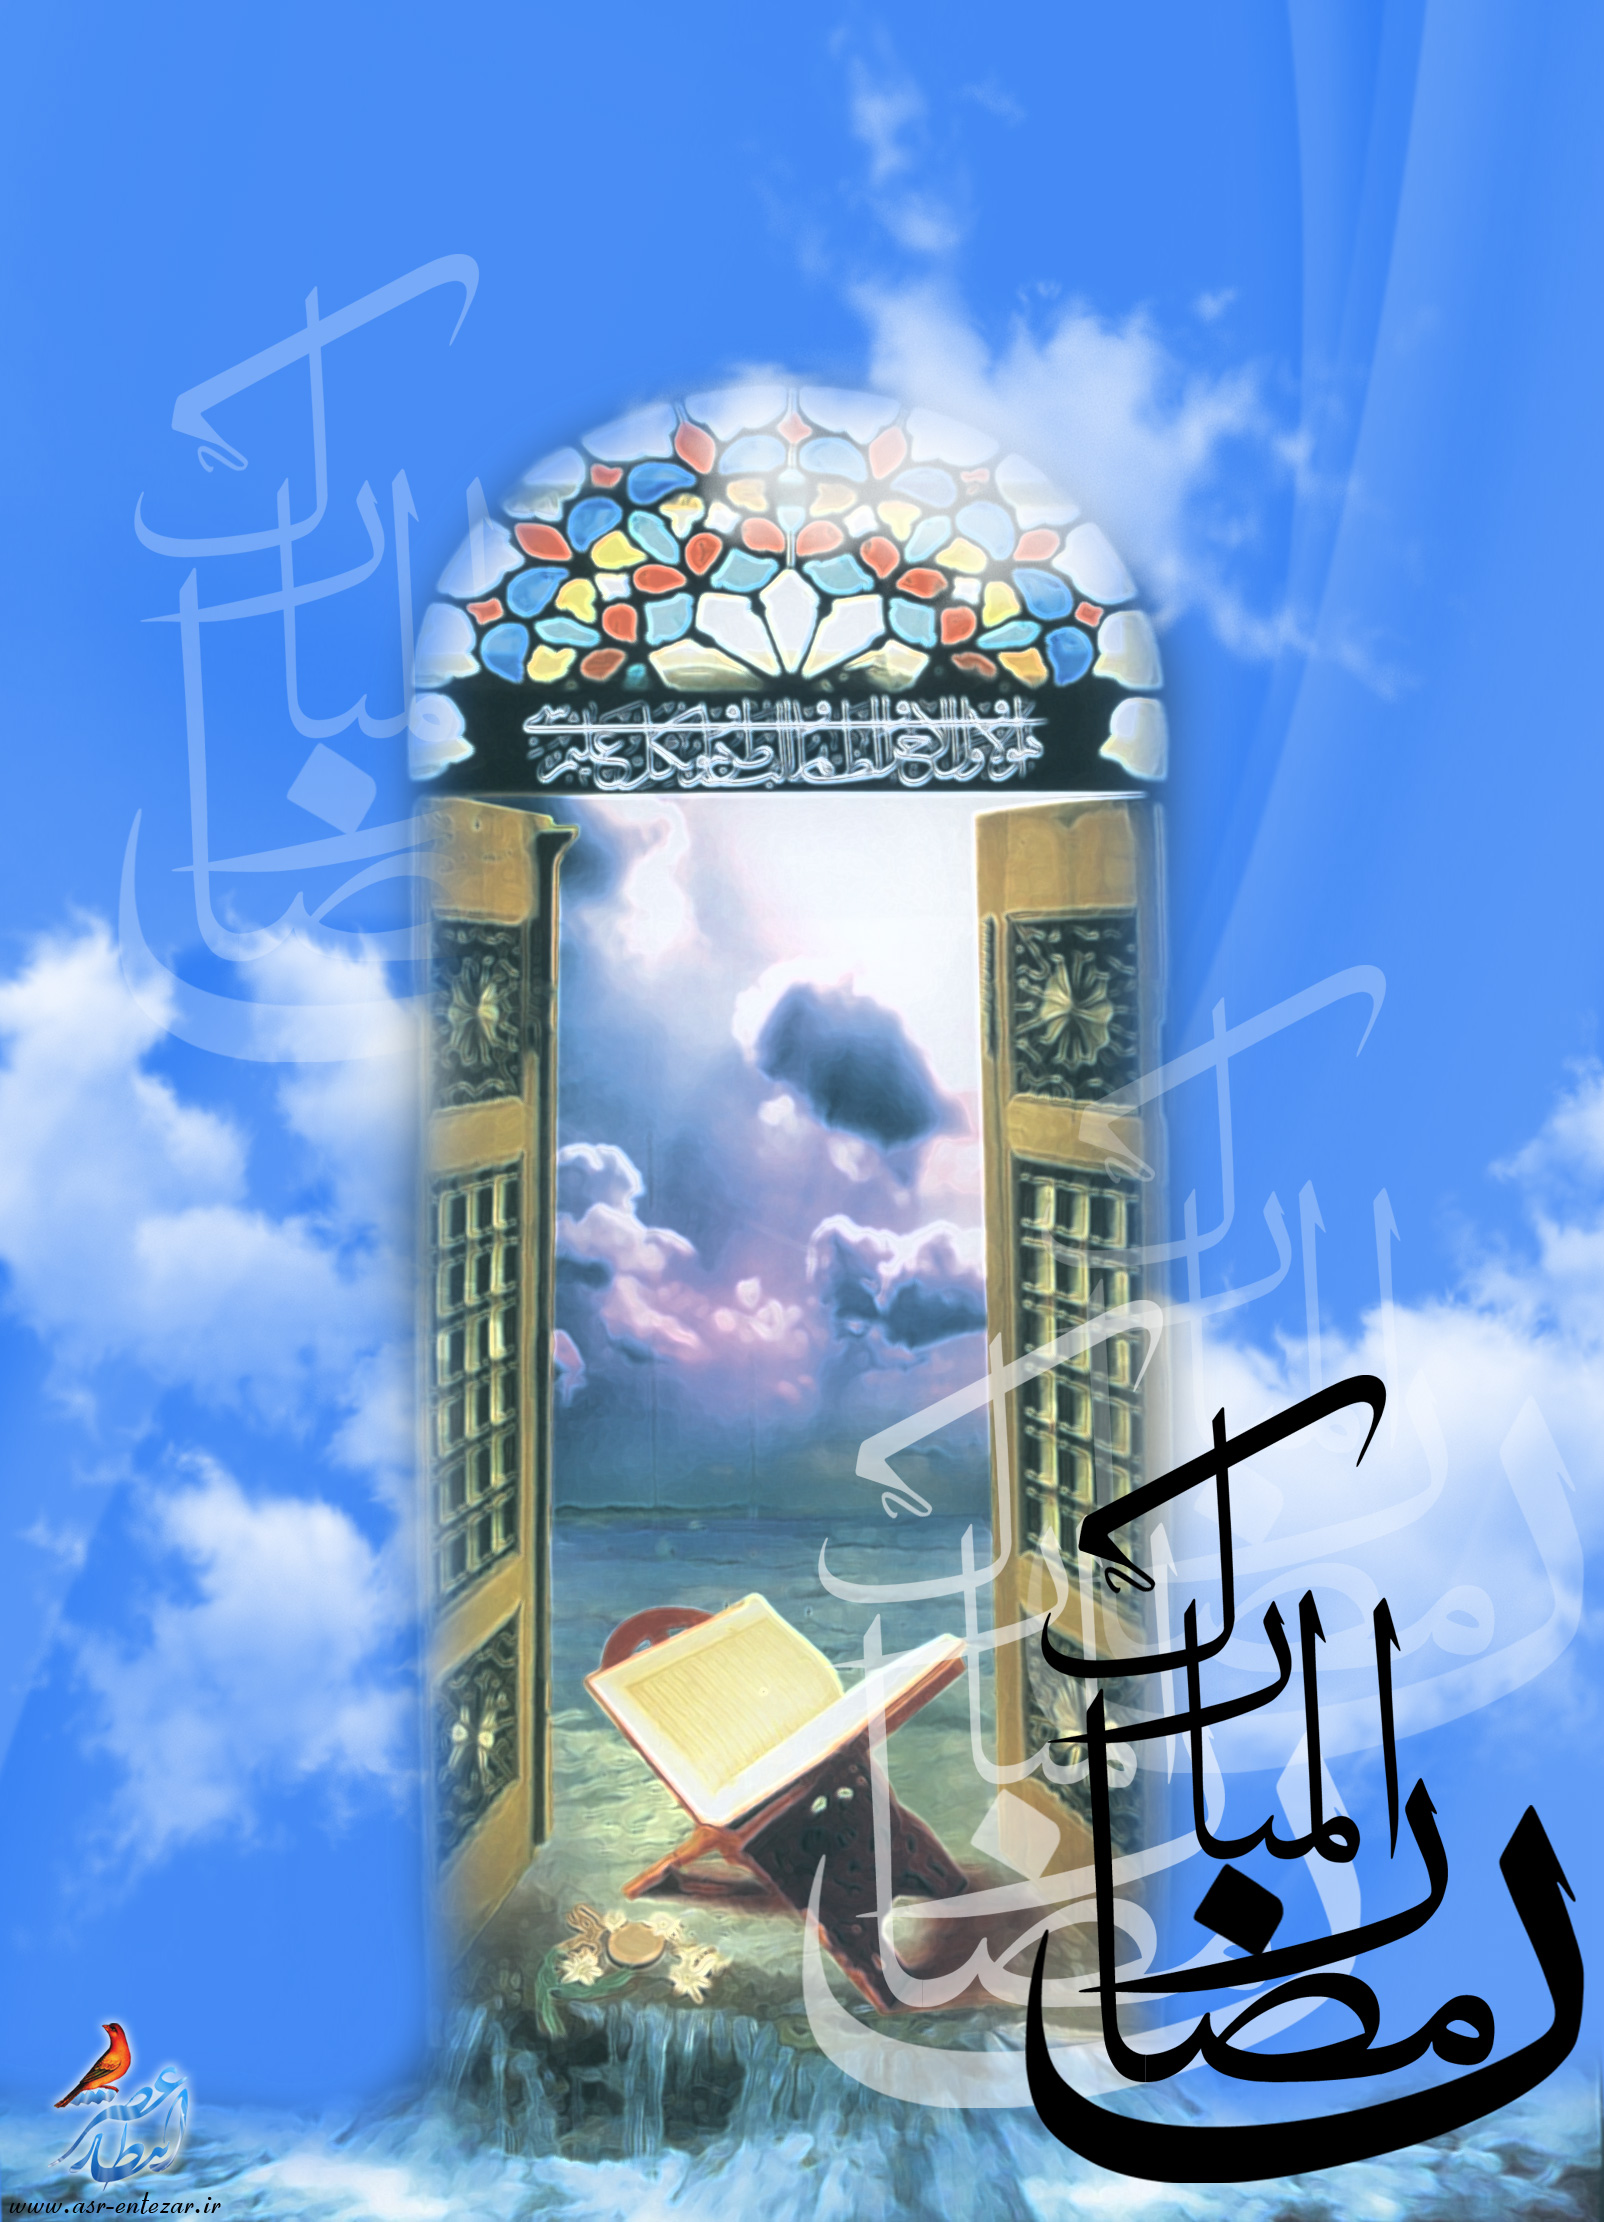 http://drhabibzadeh.com/wp-content/uploads/2017/05/1_314ramazanolmobarak100.jpeg